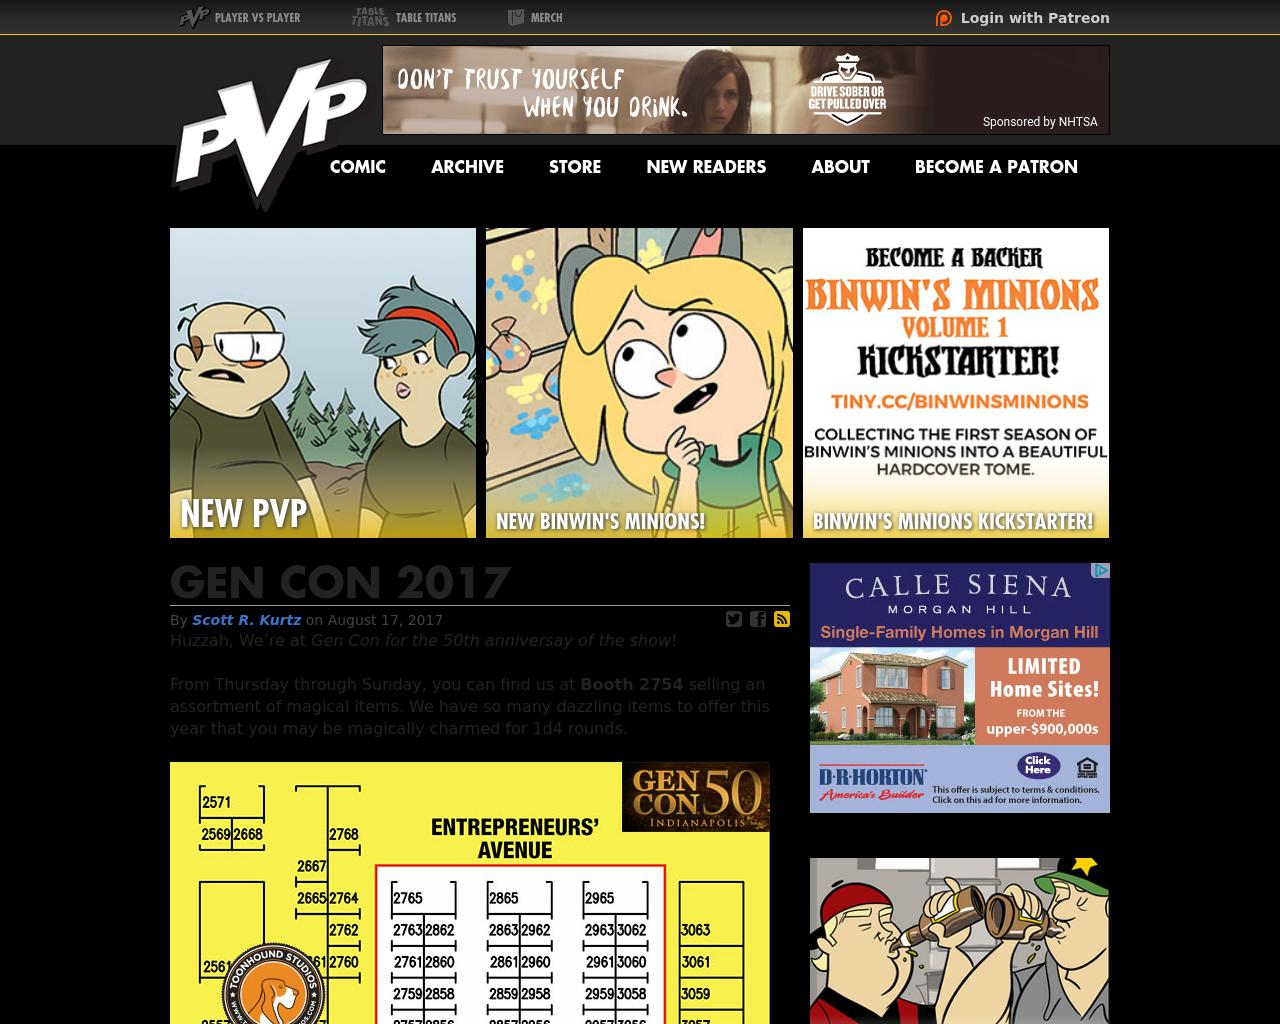 PVP-Advertising-Reviews-Pricing